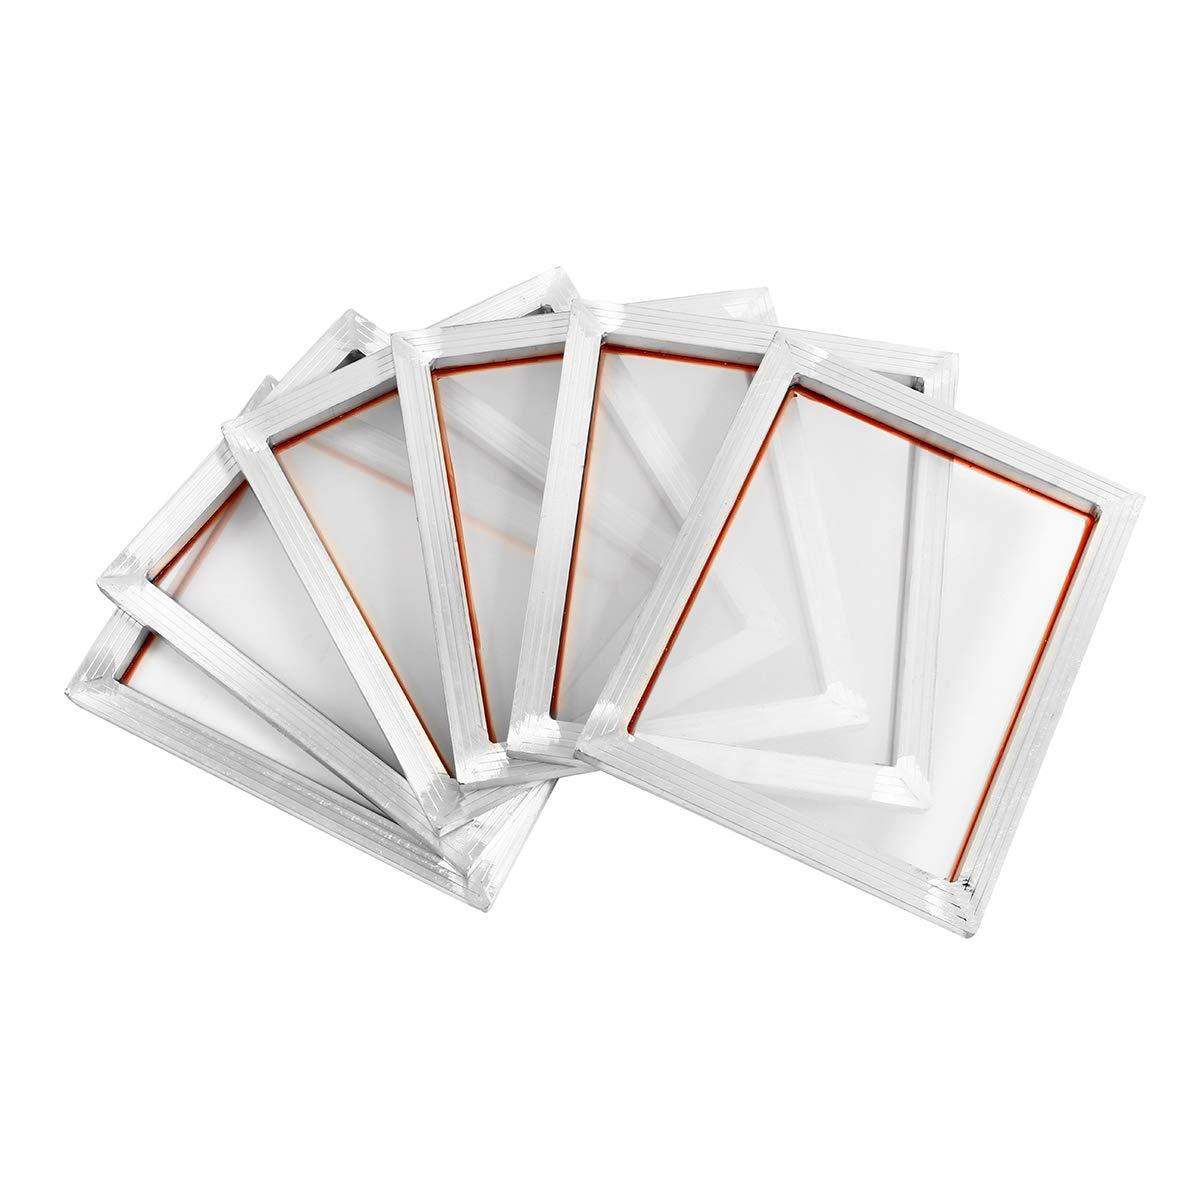 Sndy 6個の 14 ' x10 ' ' アルミ合金シルクスクリーン印刷フレーム w 110 ホワイトメッシュカウント   B07L94YWGX